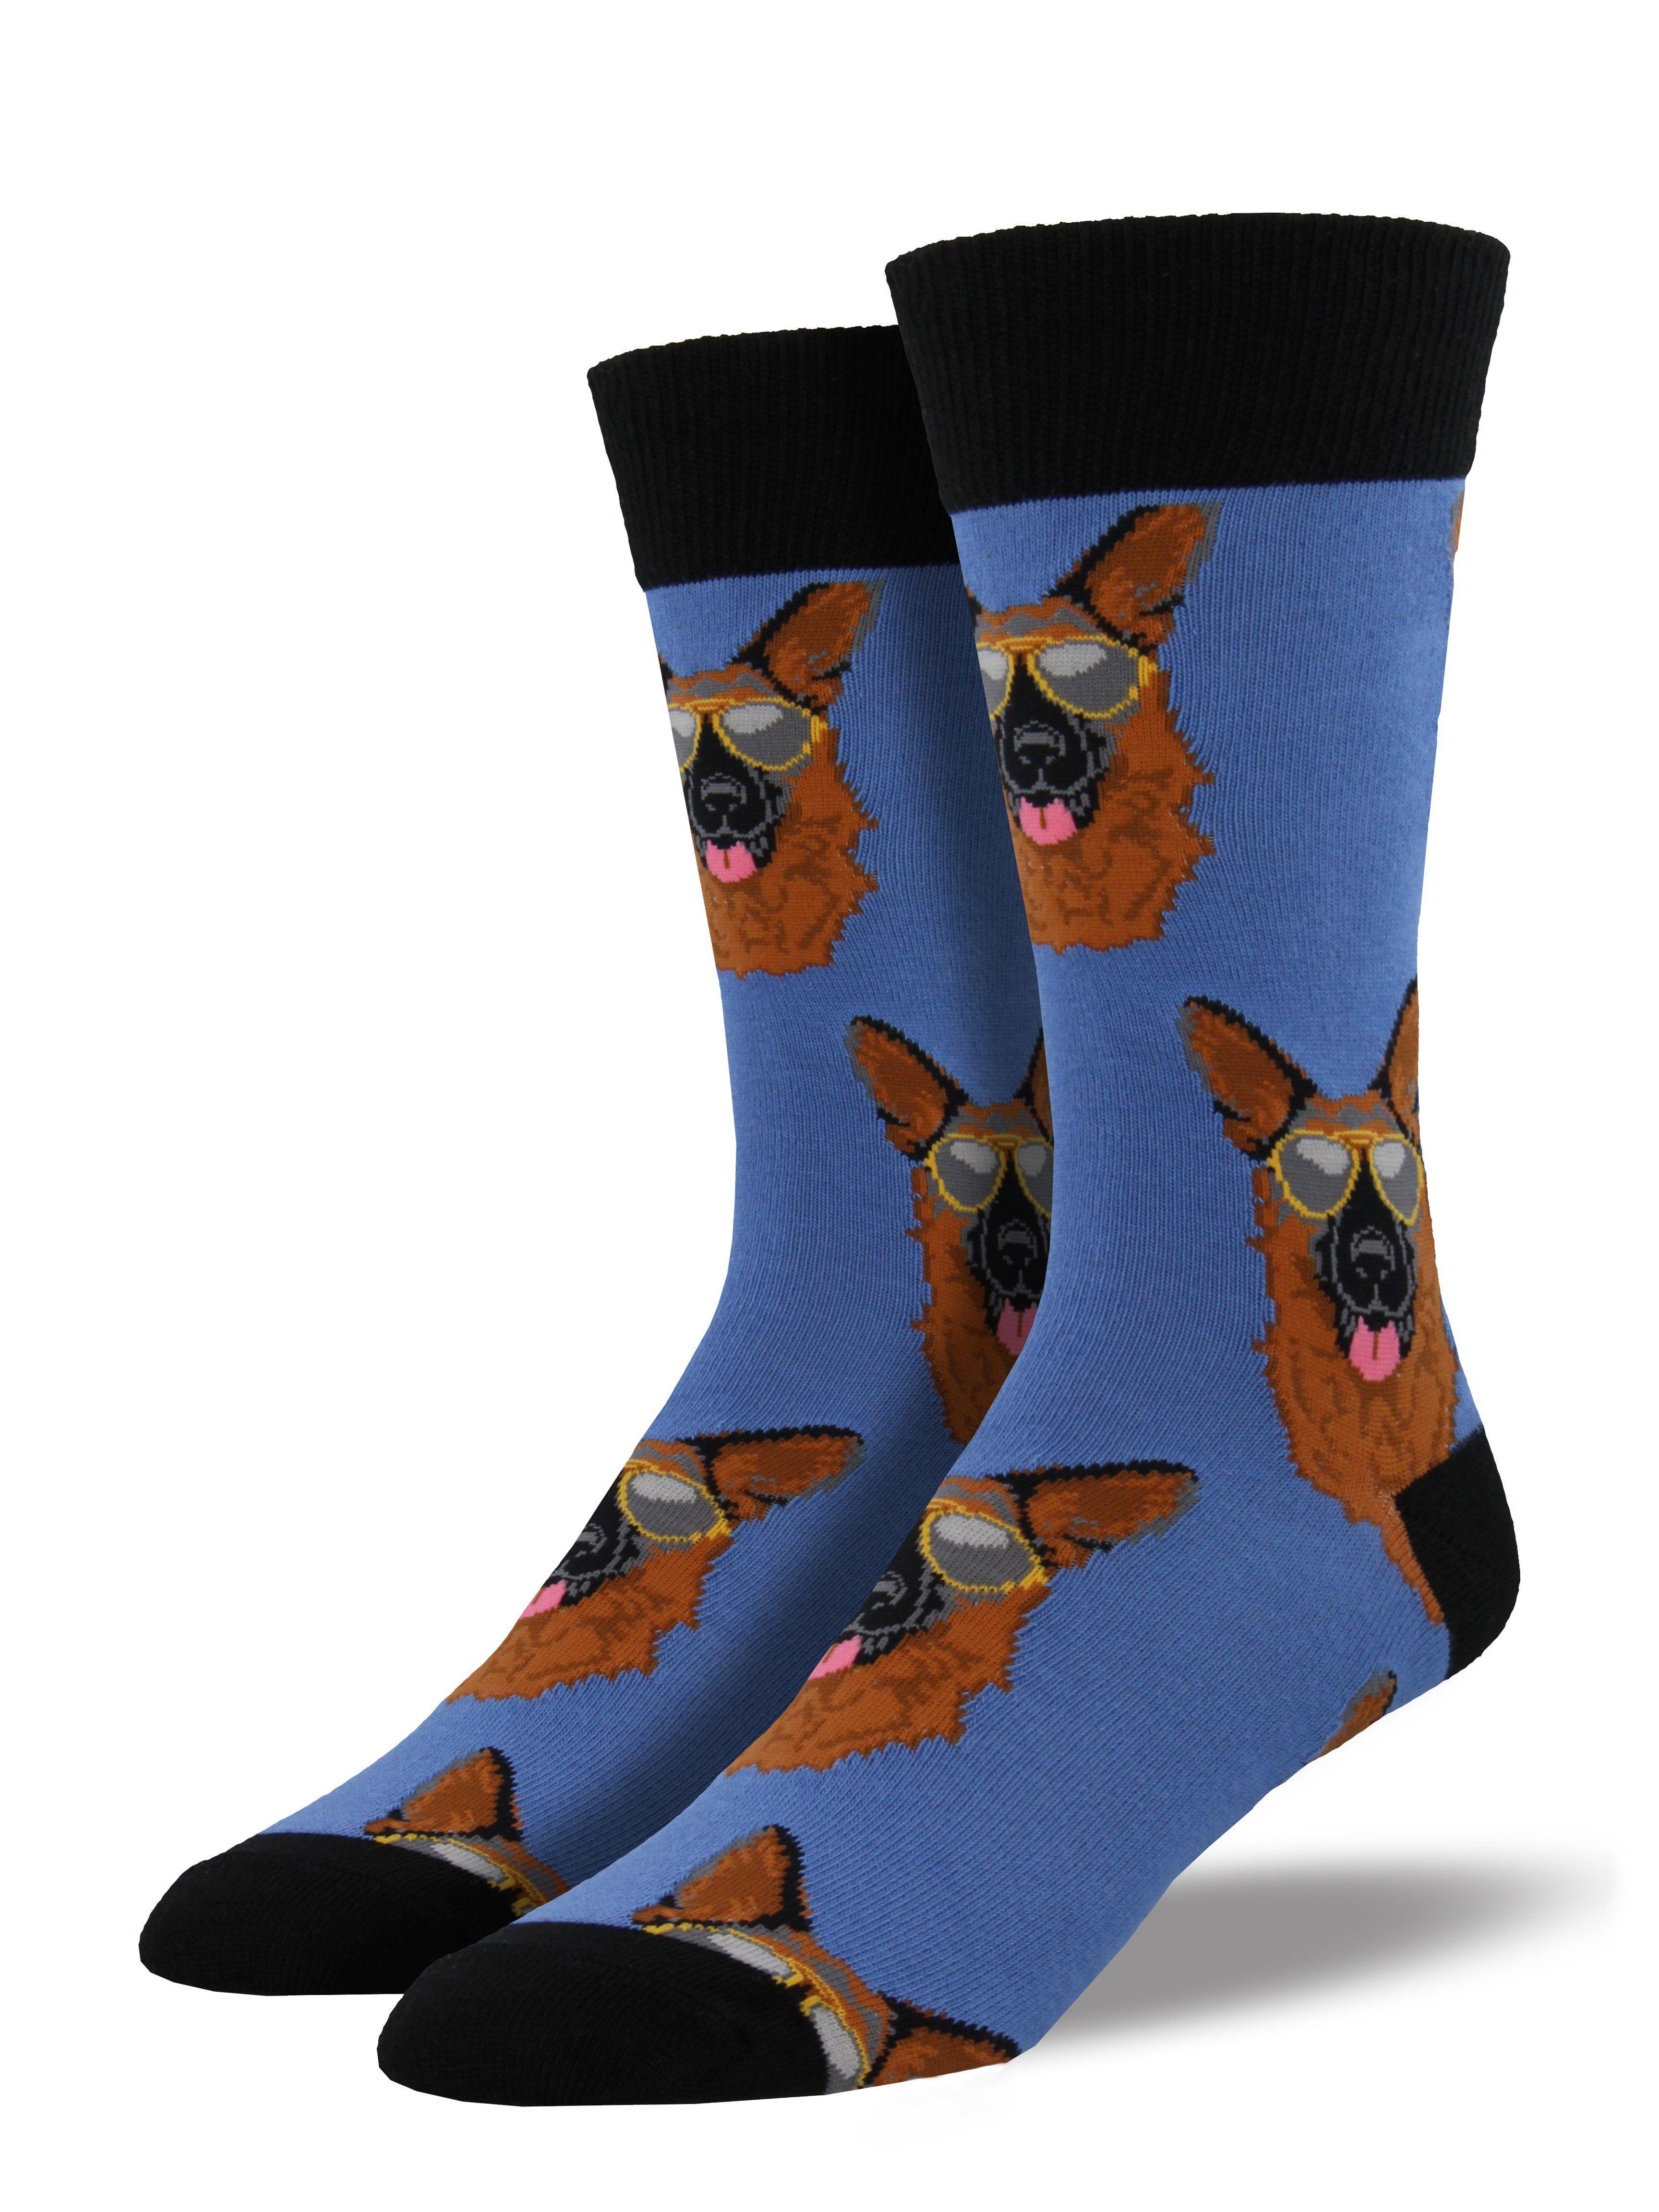 Men's K9 Unit Socks